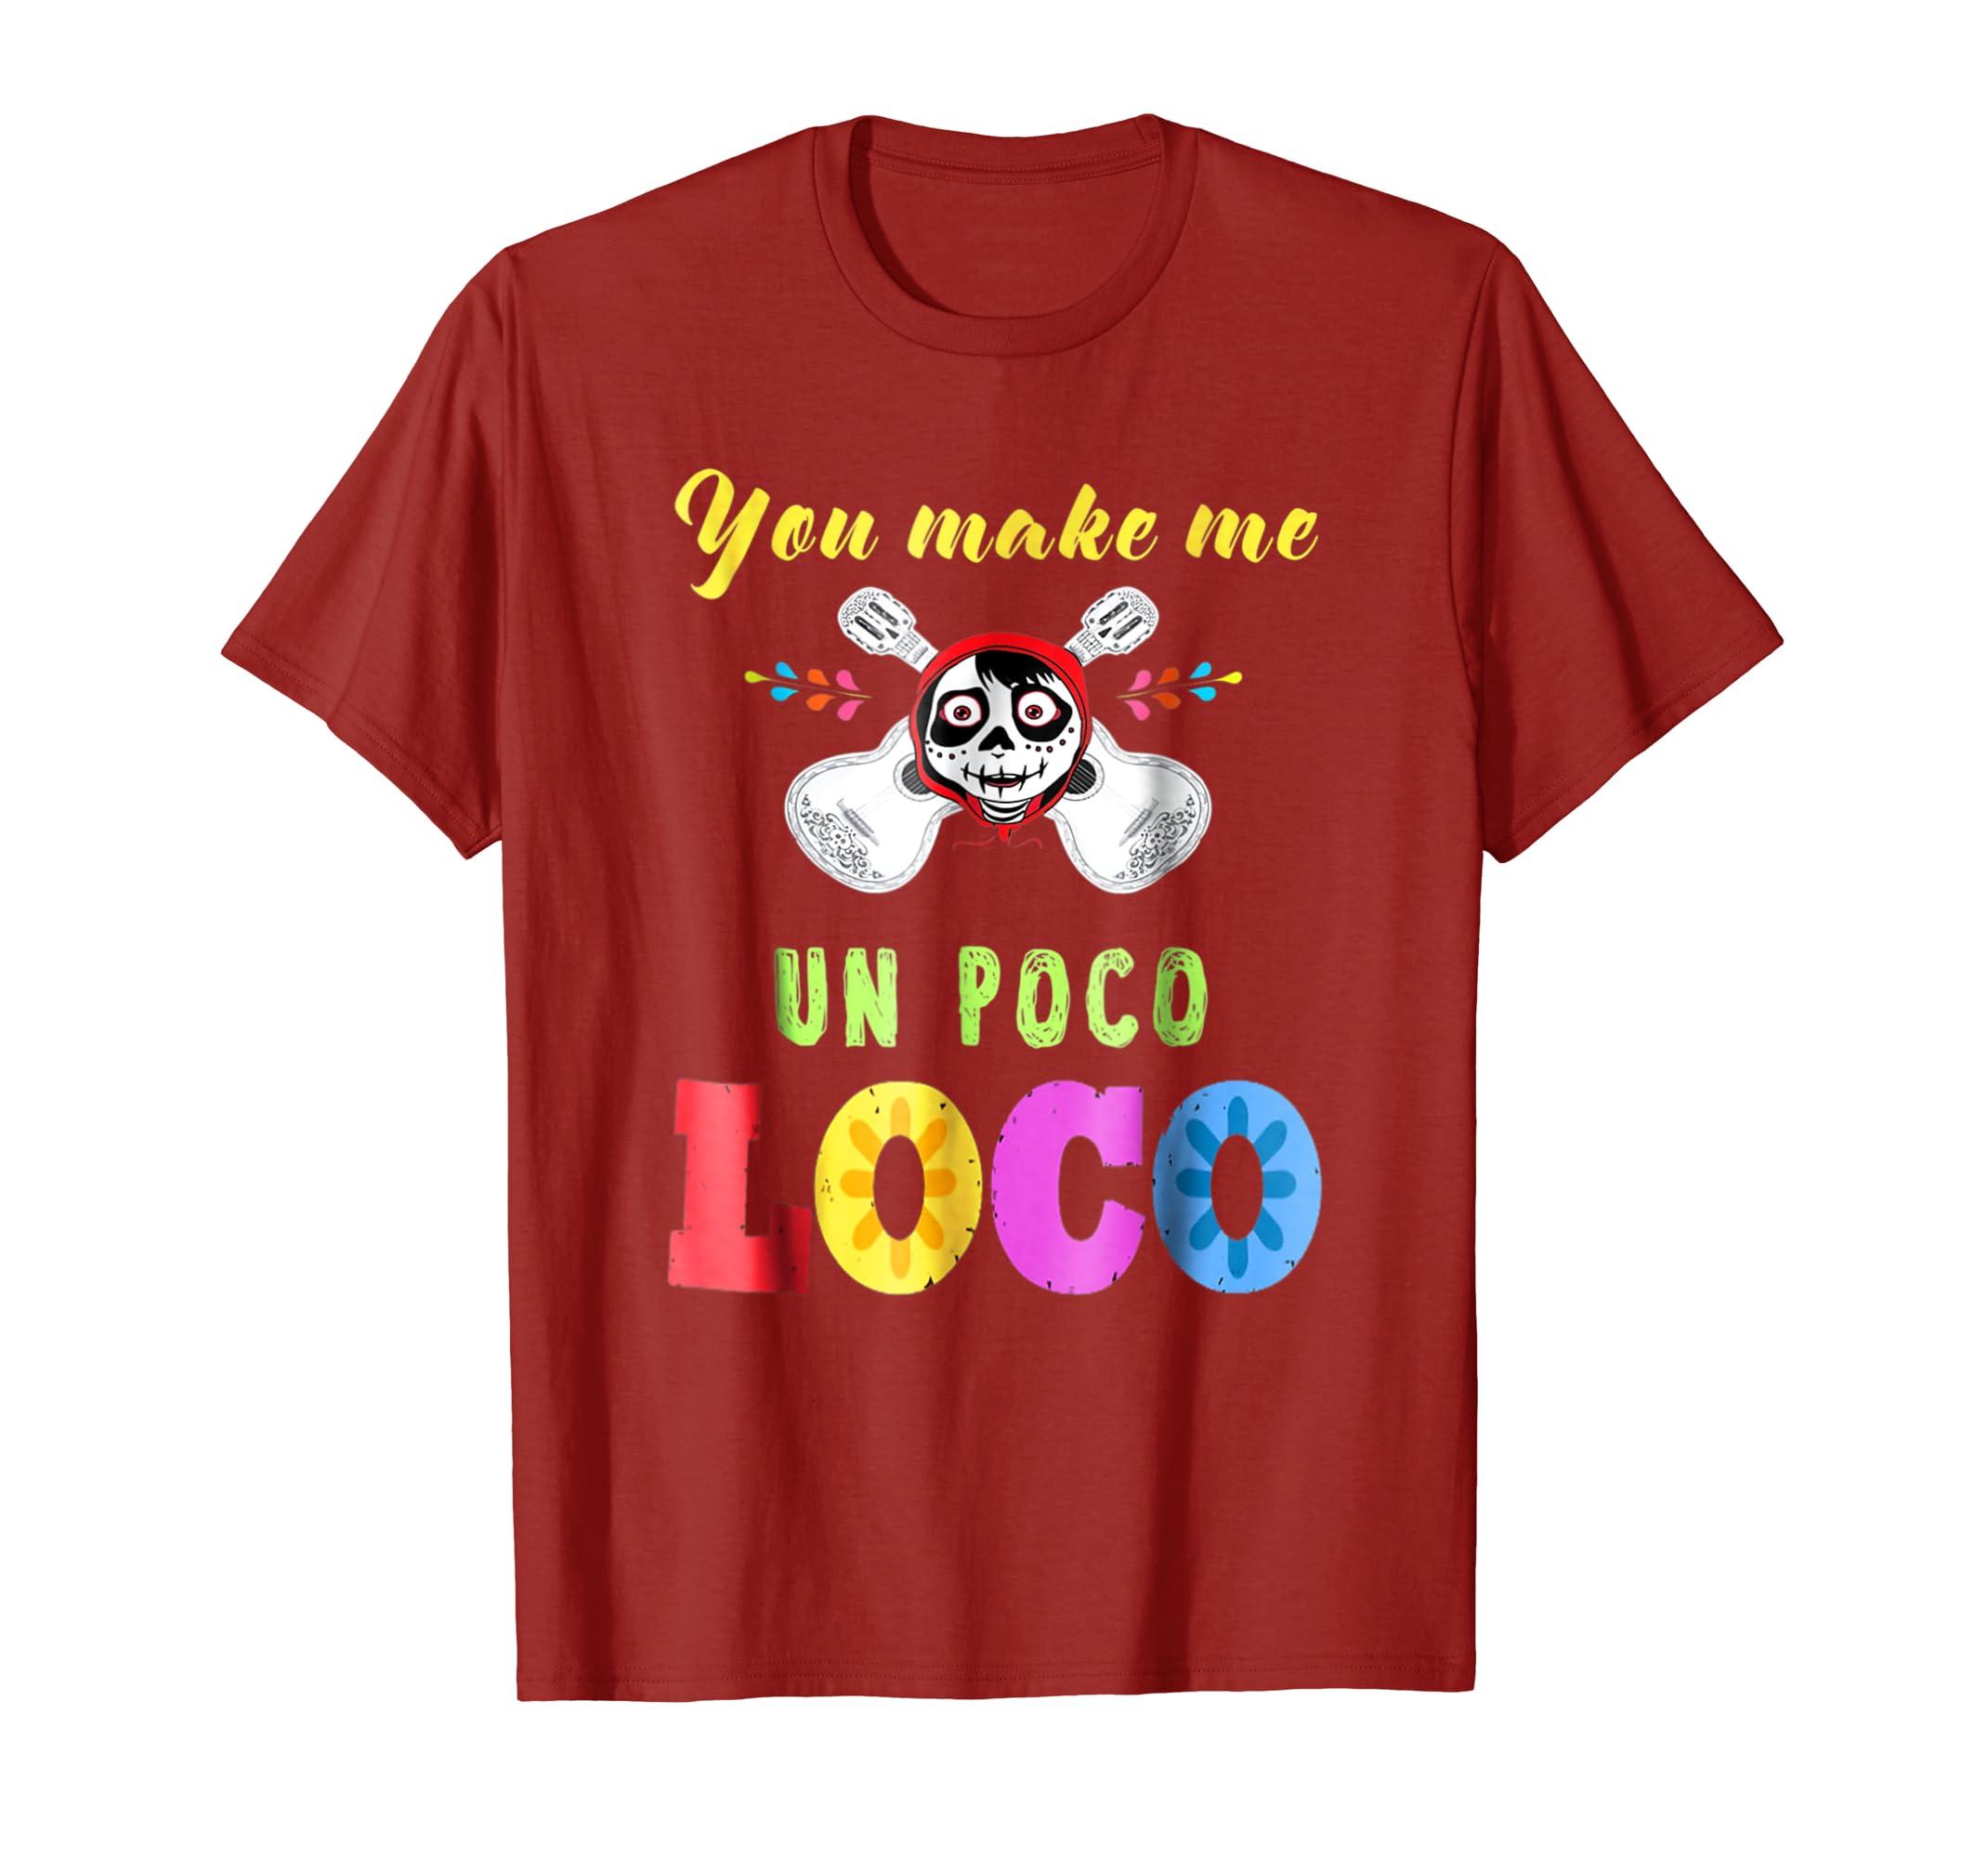 0255d9a4 Amazon.com: You Make Me Un Poco Loco Kids Tee Coco Kids Tshirt: Clothing